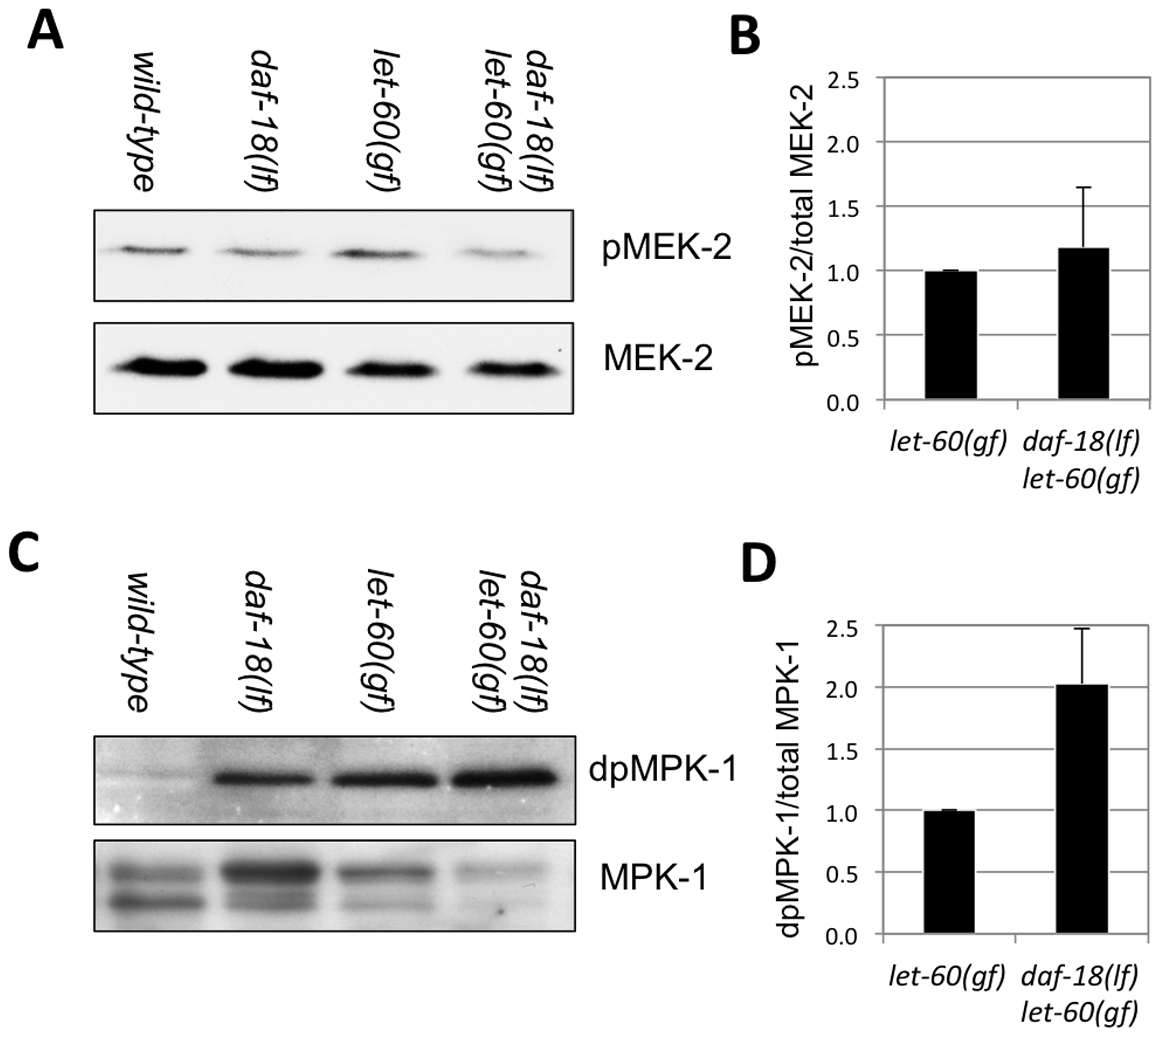 DAF-18 inhibits MPK-1 phosphorylation.